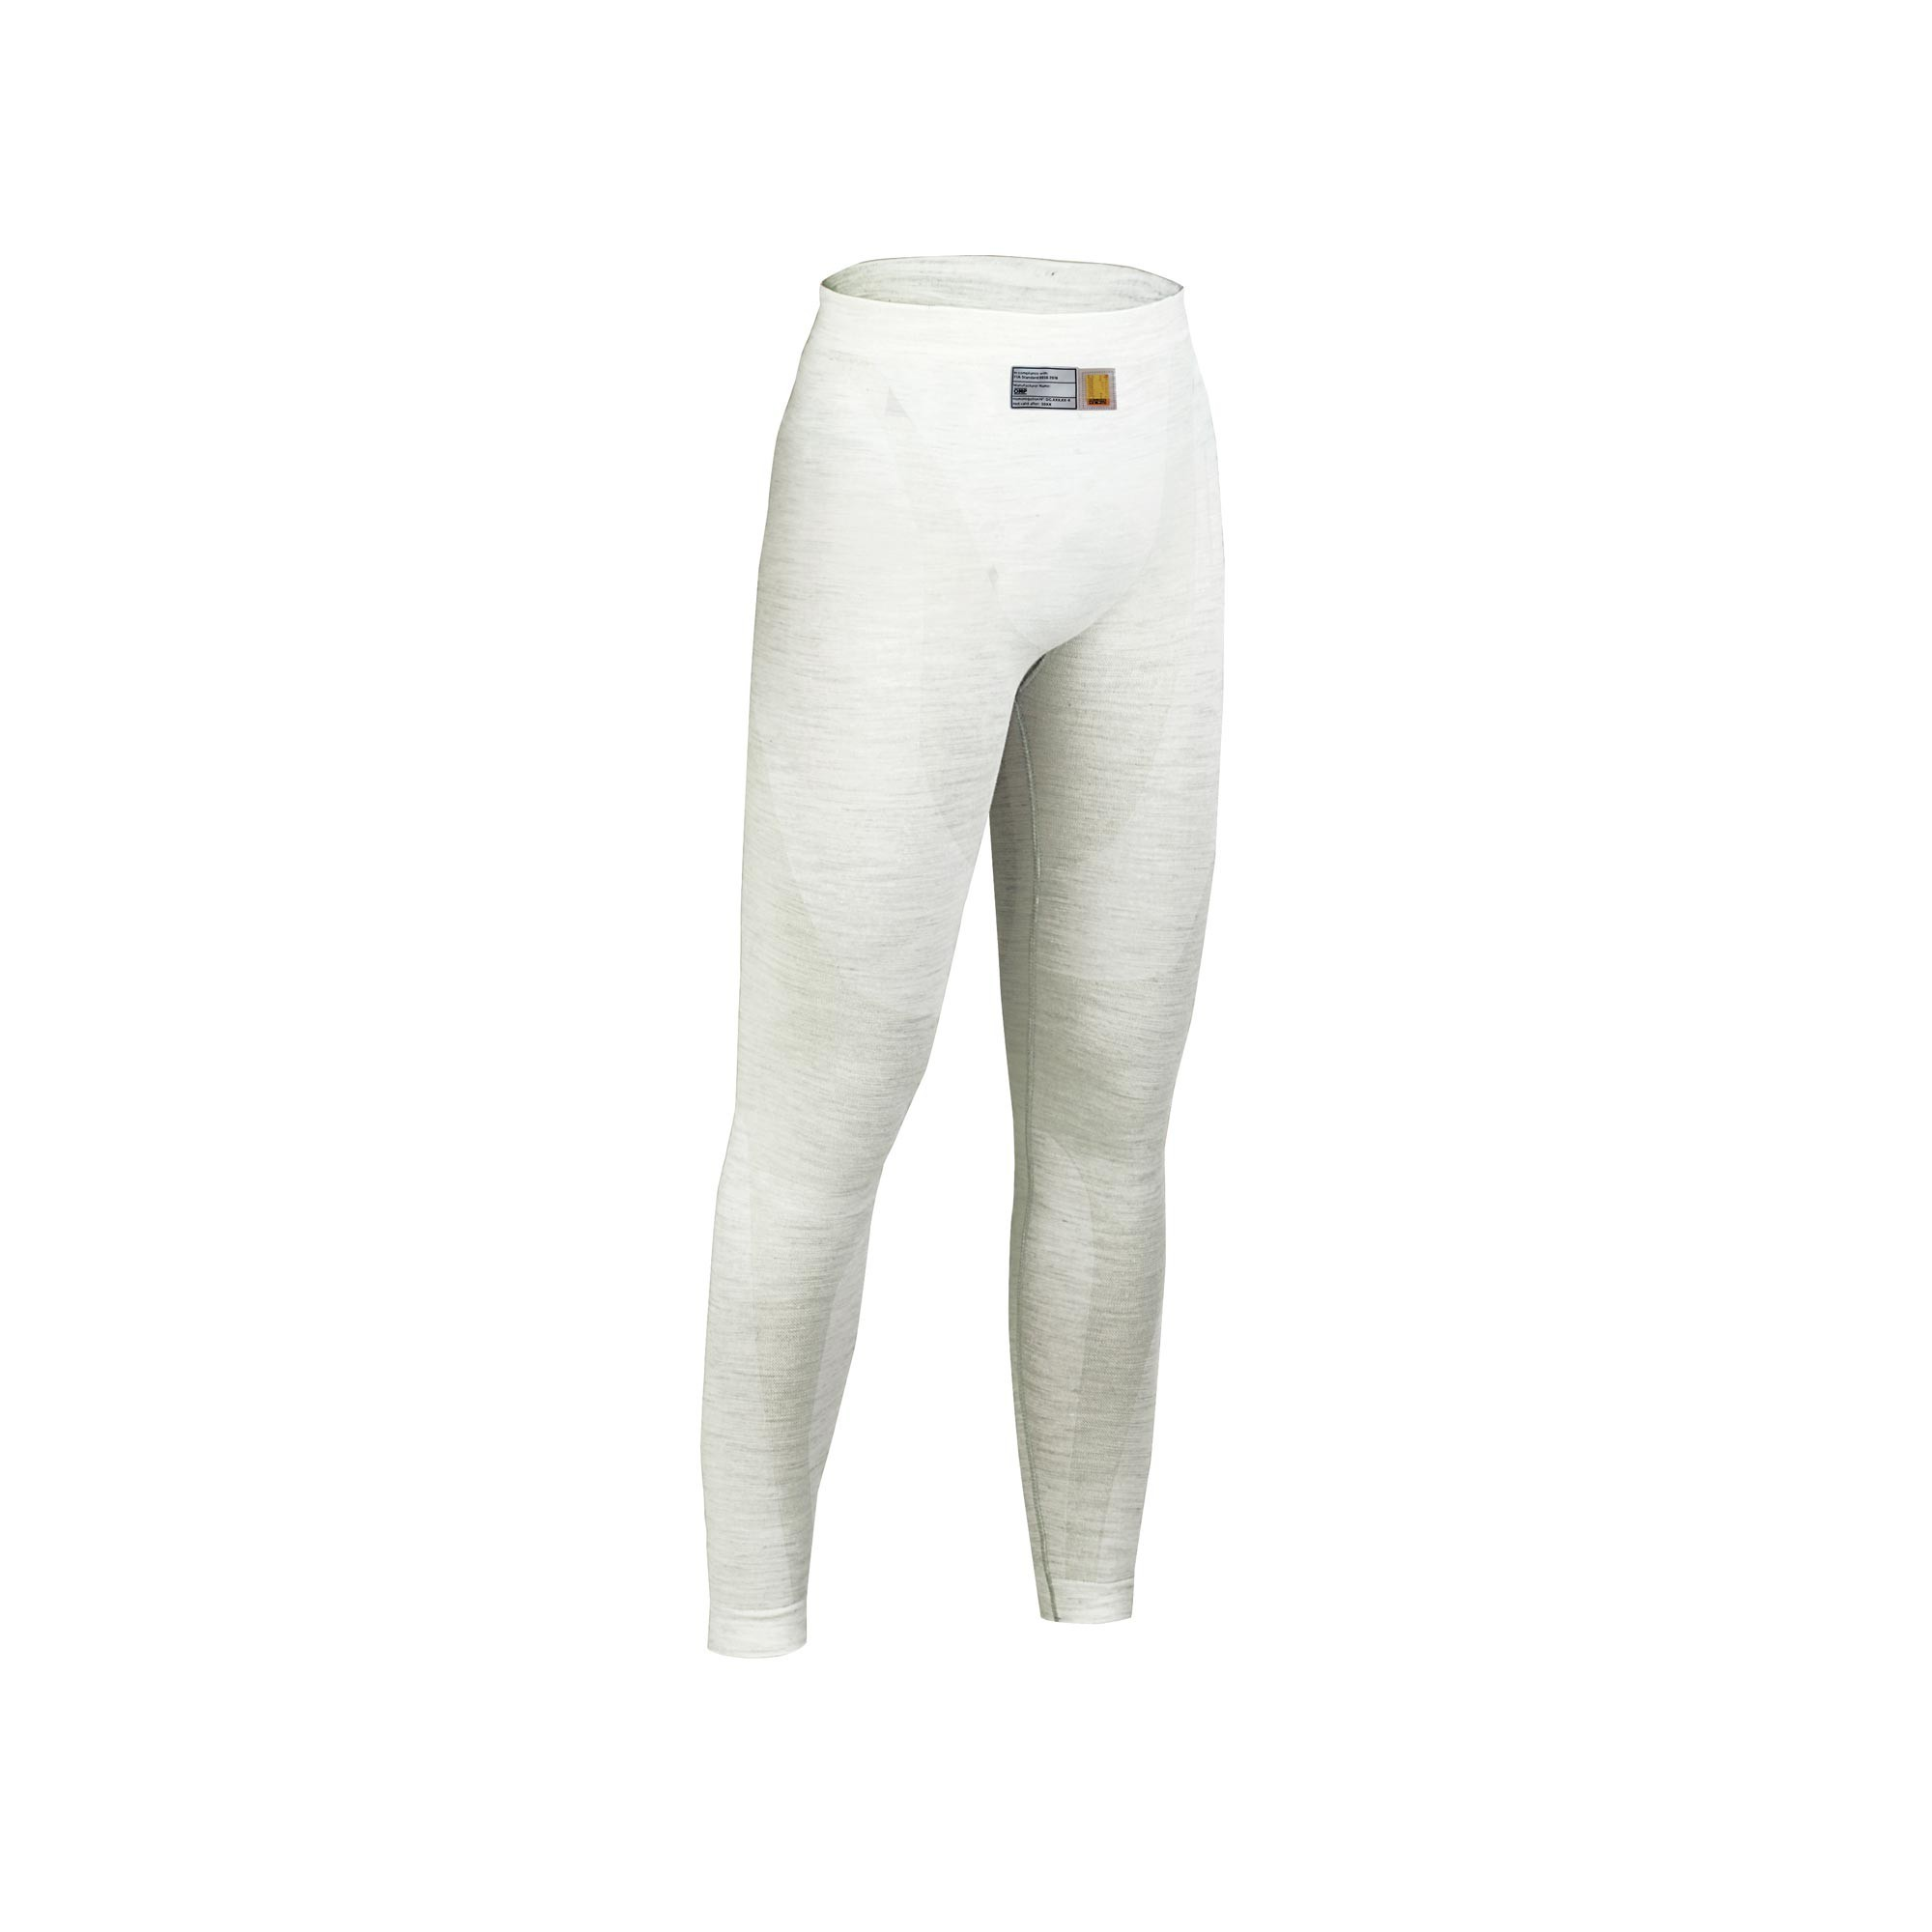 ONE Pants